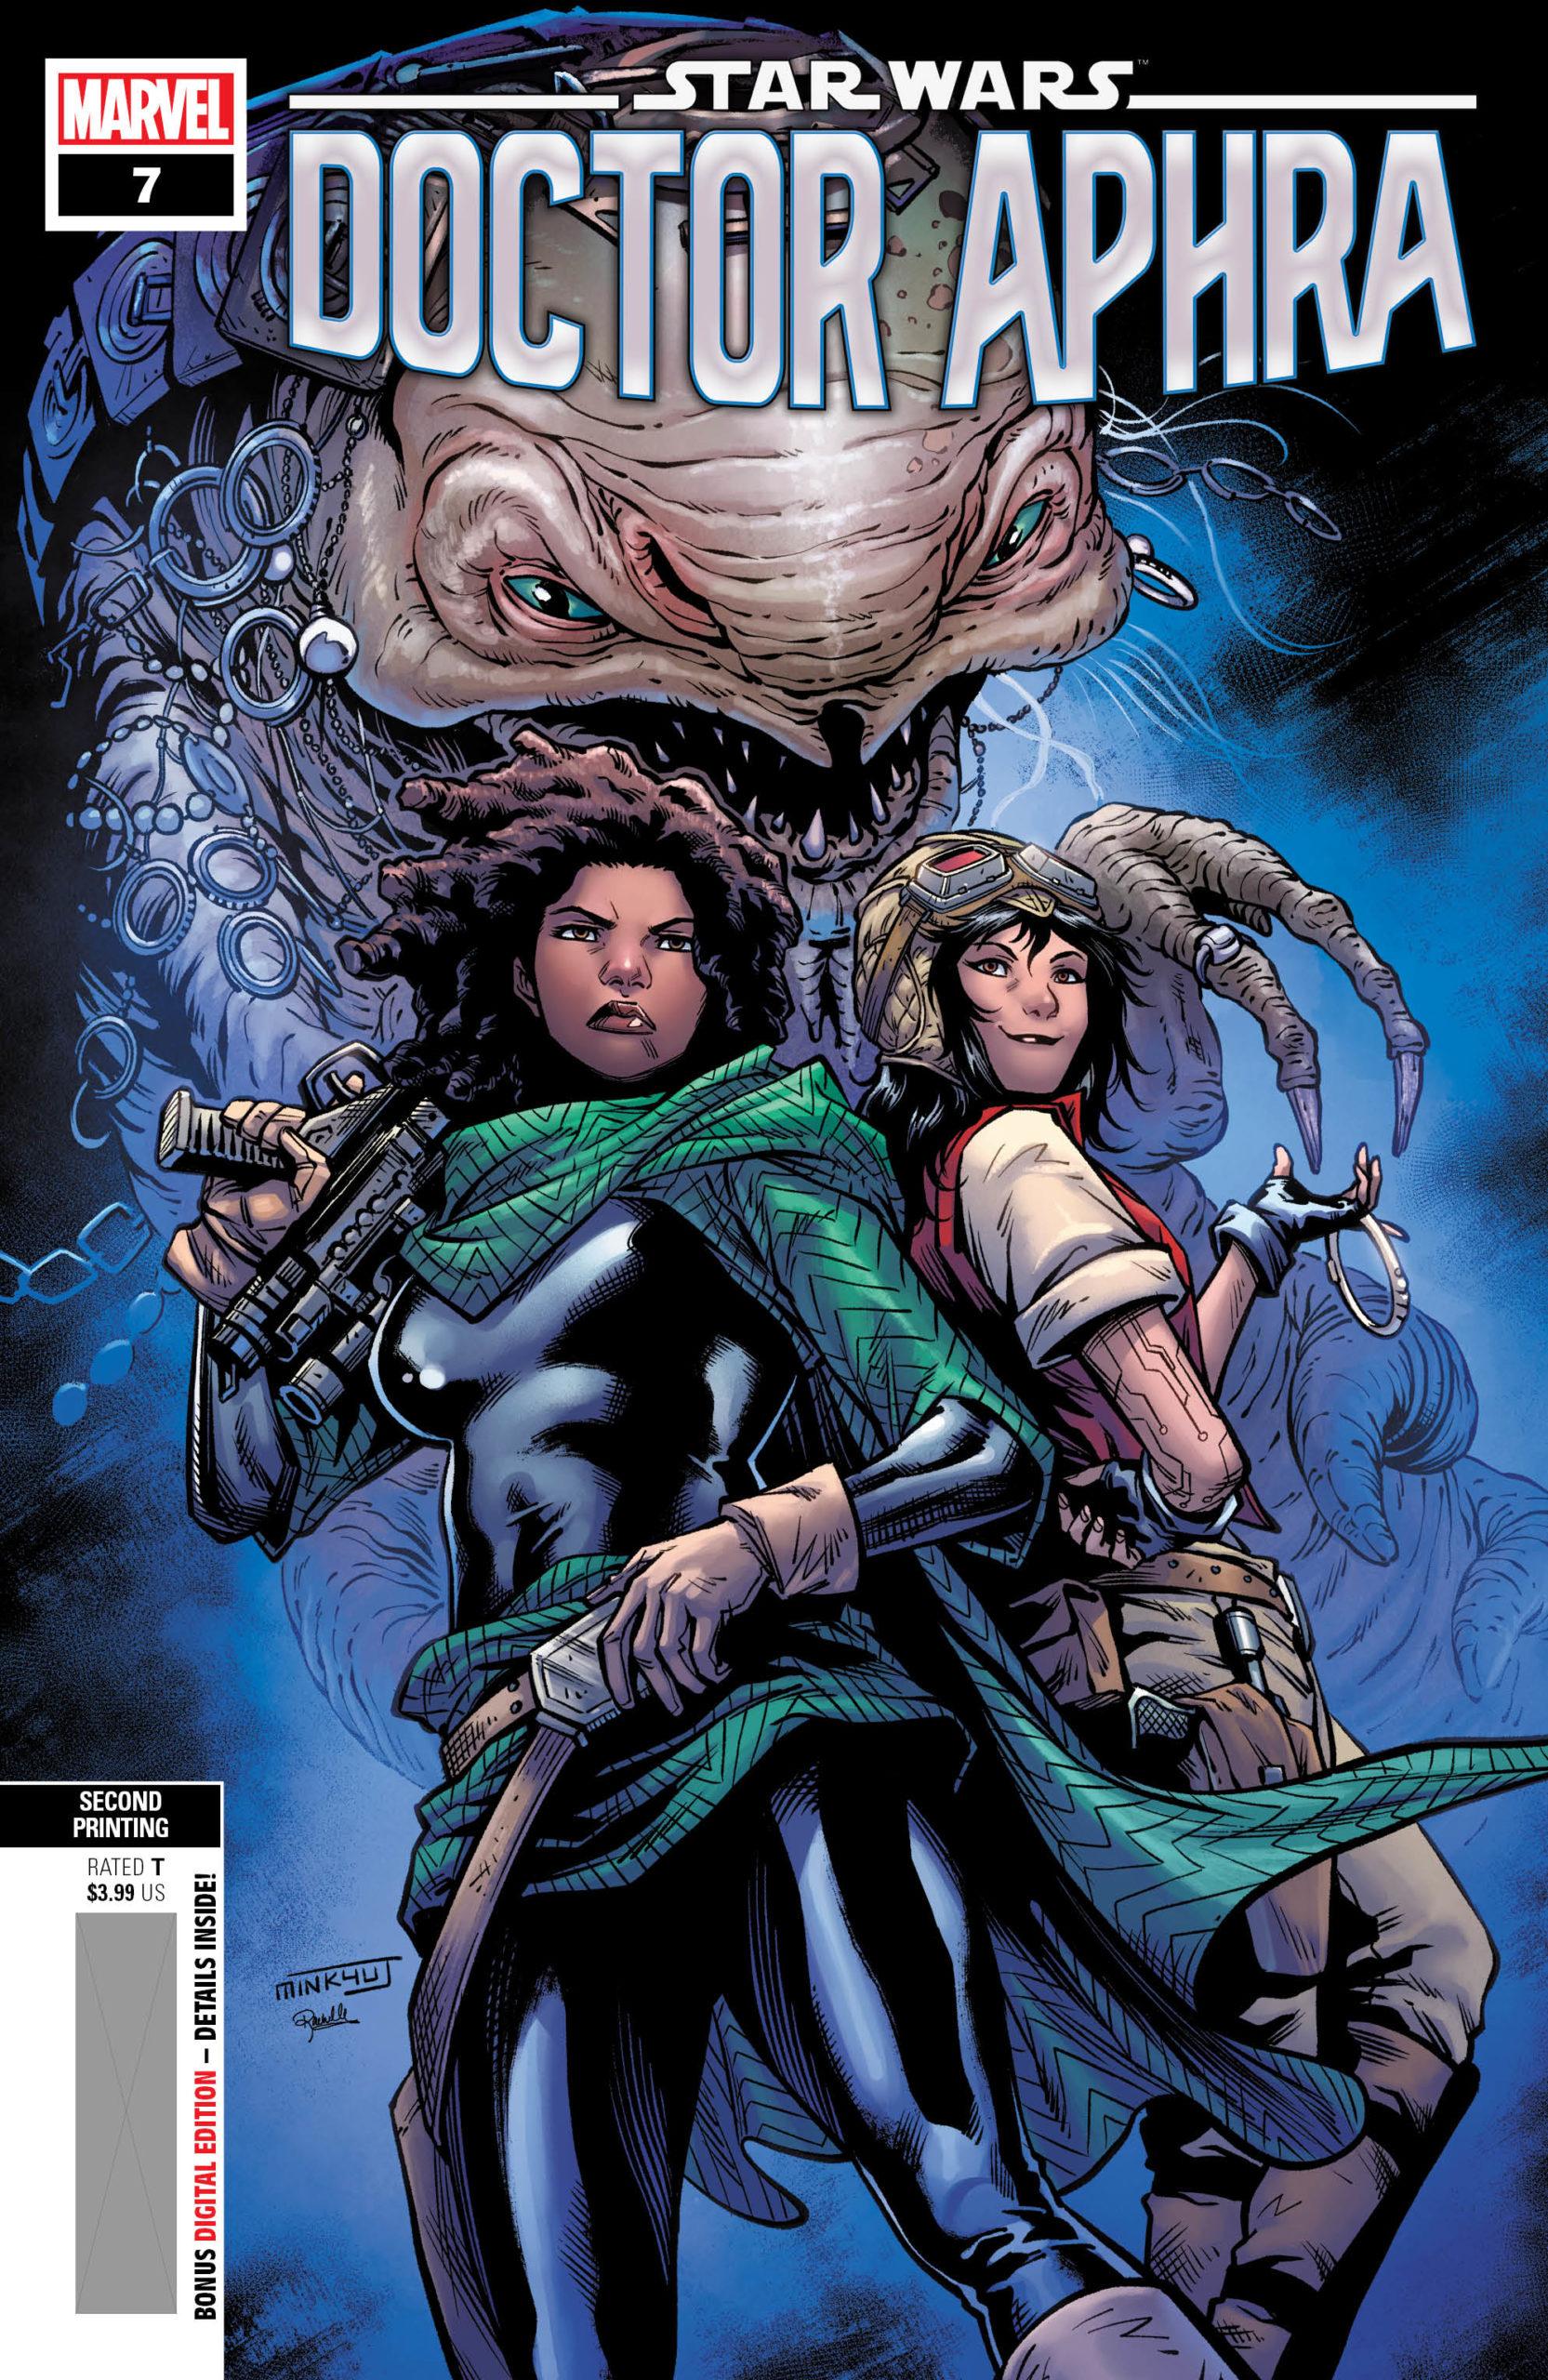 Doctor Aphra #7 (2nd Printing) (24.02.2021)